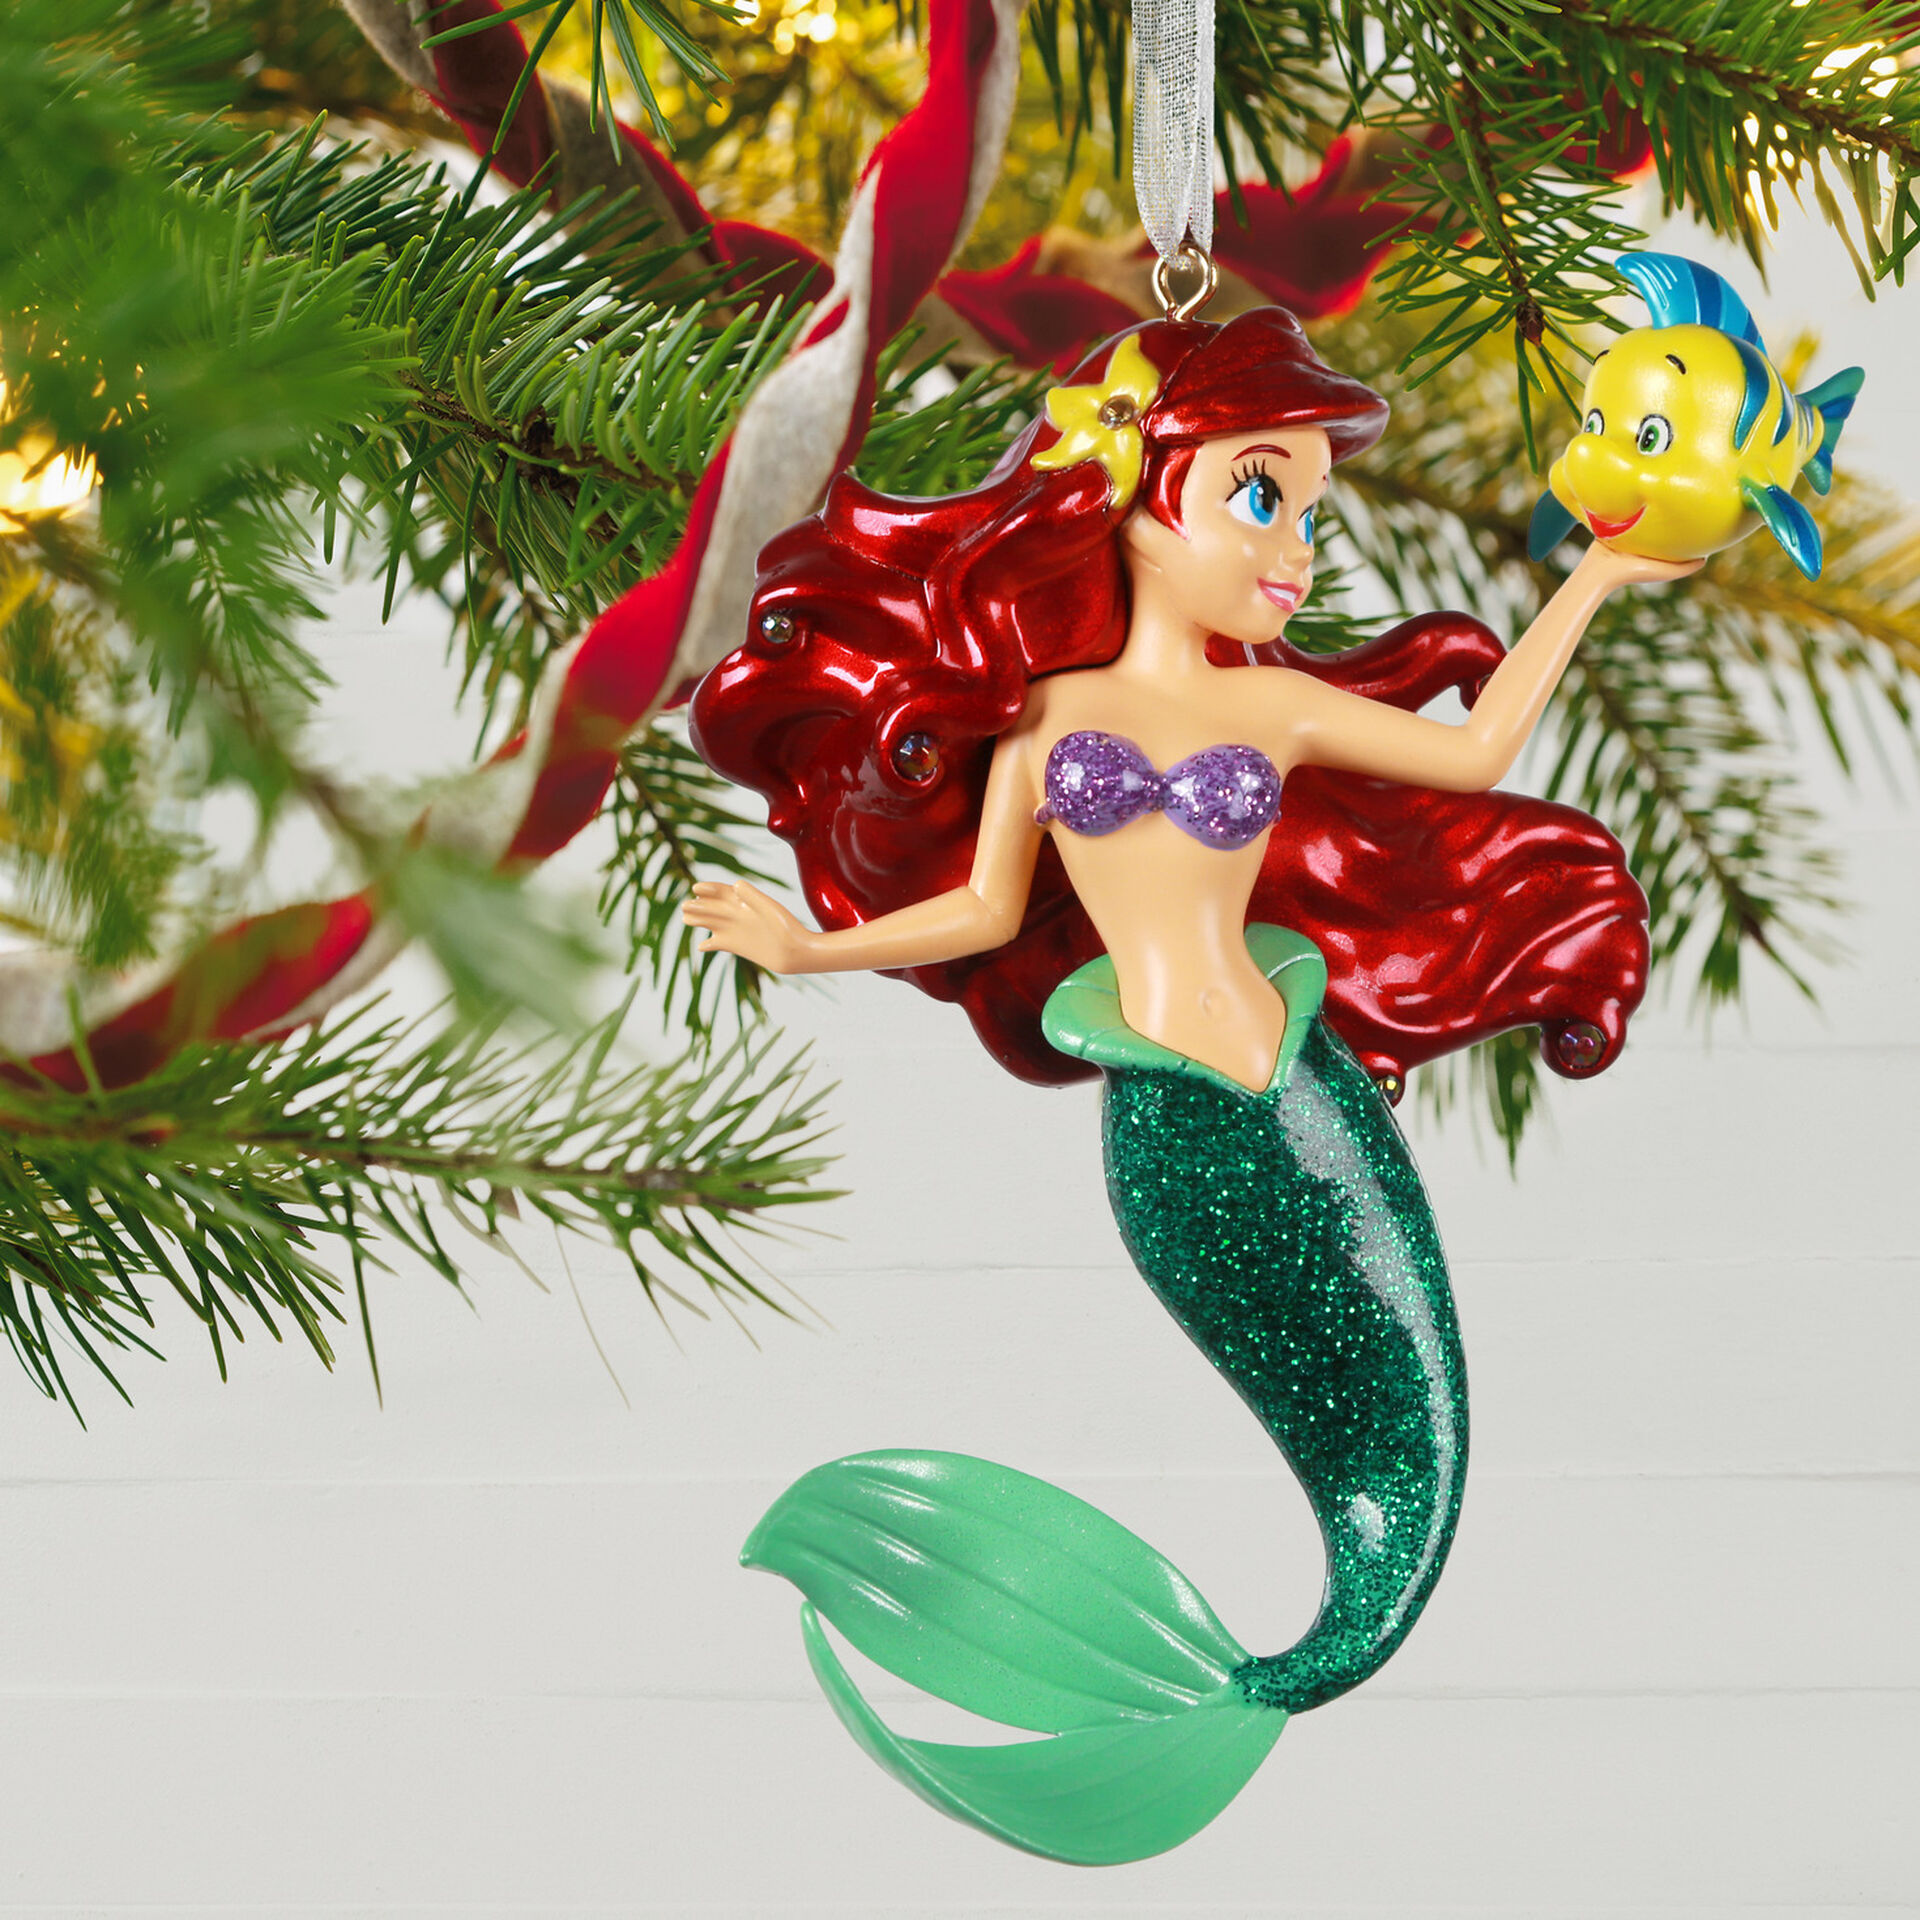 Little Mermaid Ornaments Christmas 2020 Disney The Little Mermaid Ariel and Flounder Metal Ornament